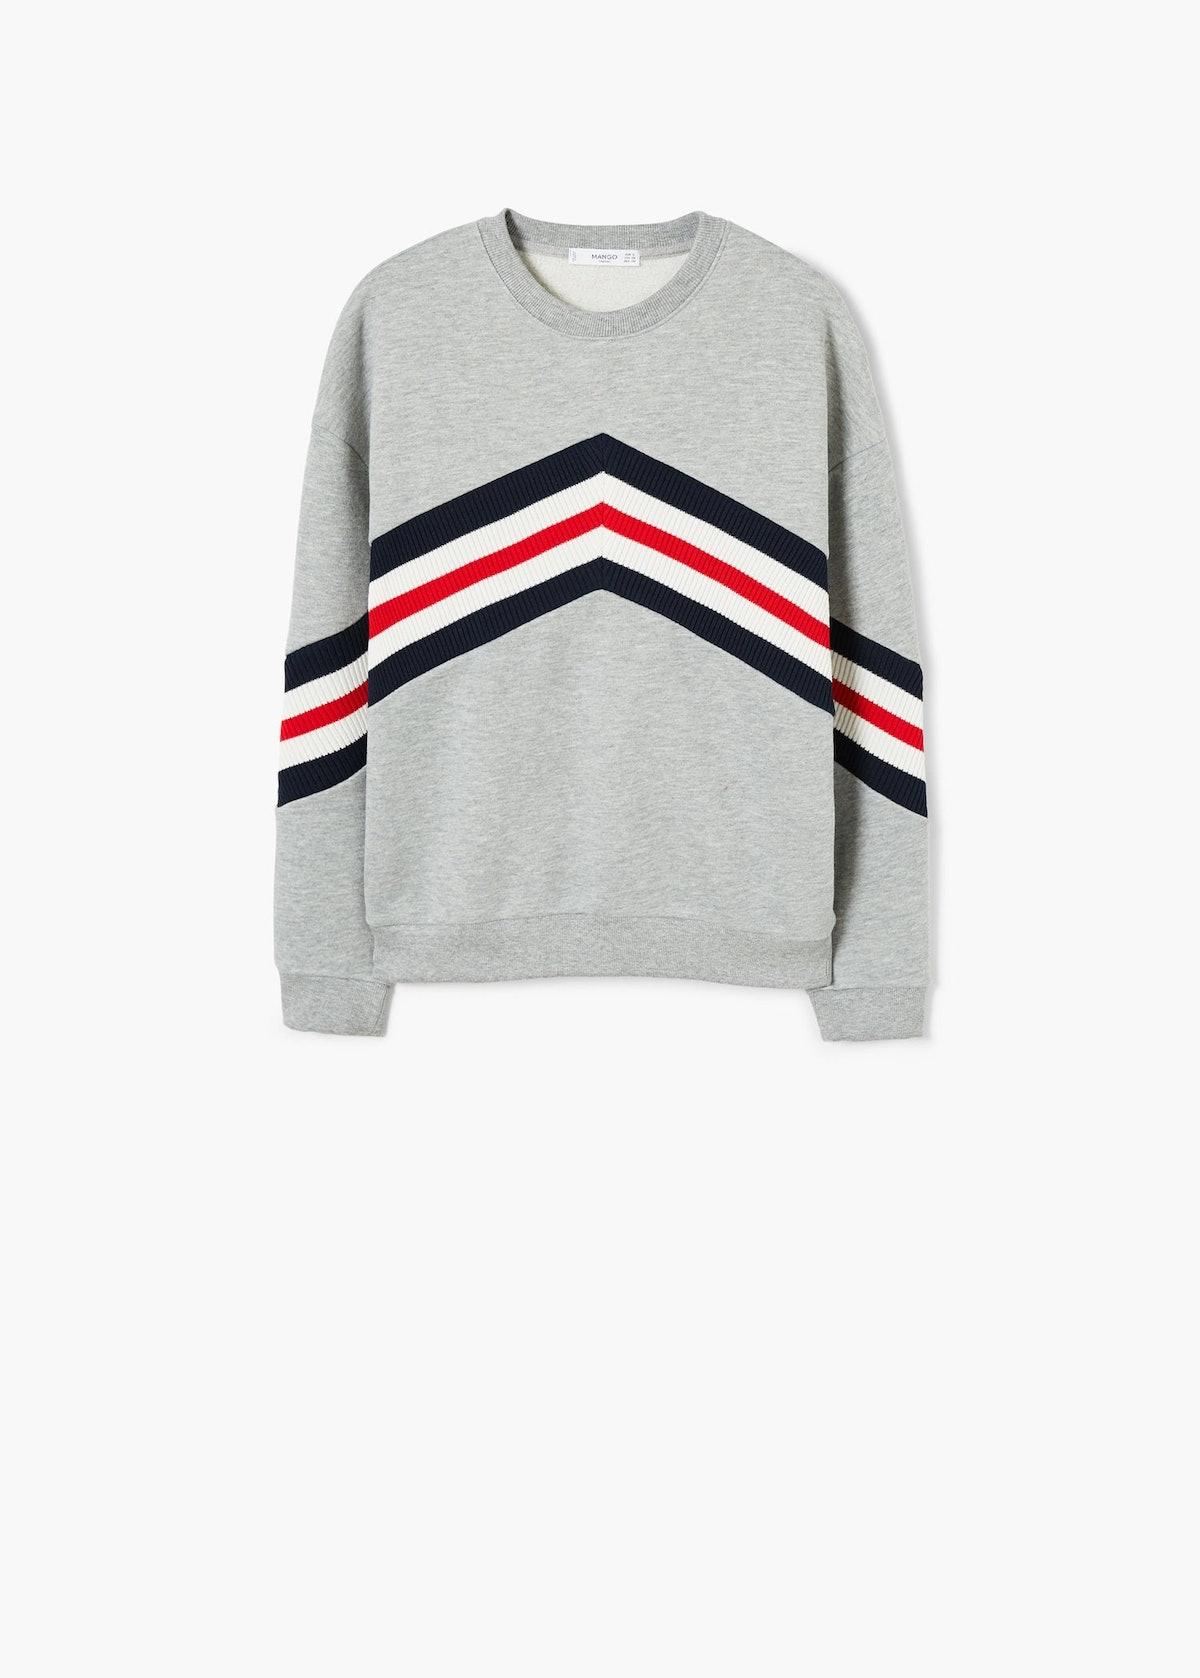 Mixed Cotton Sweatshirt